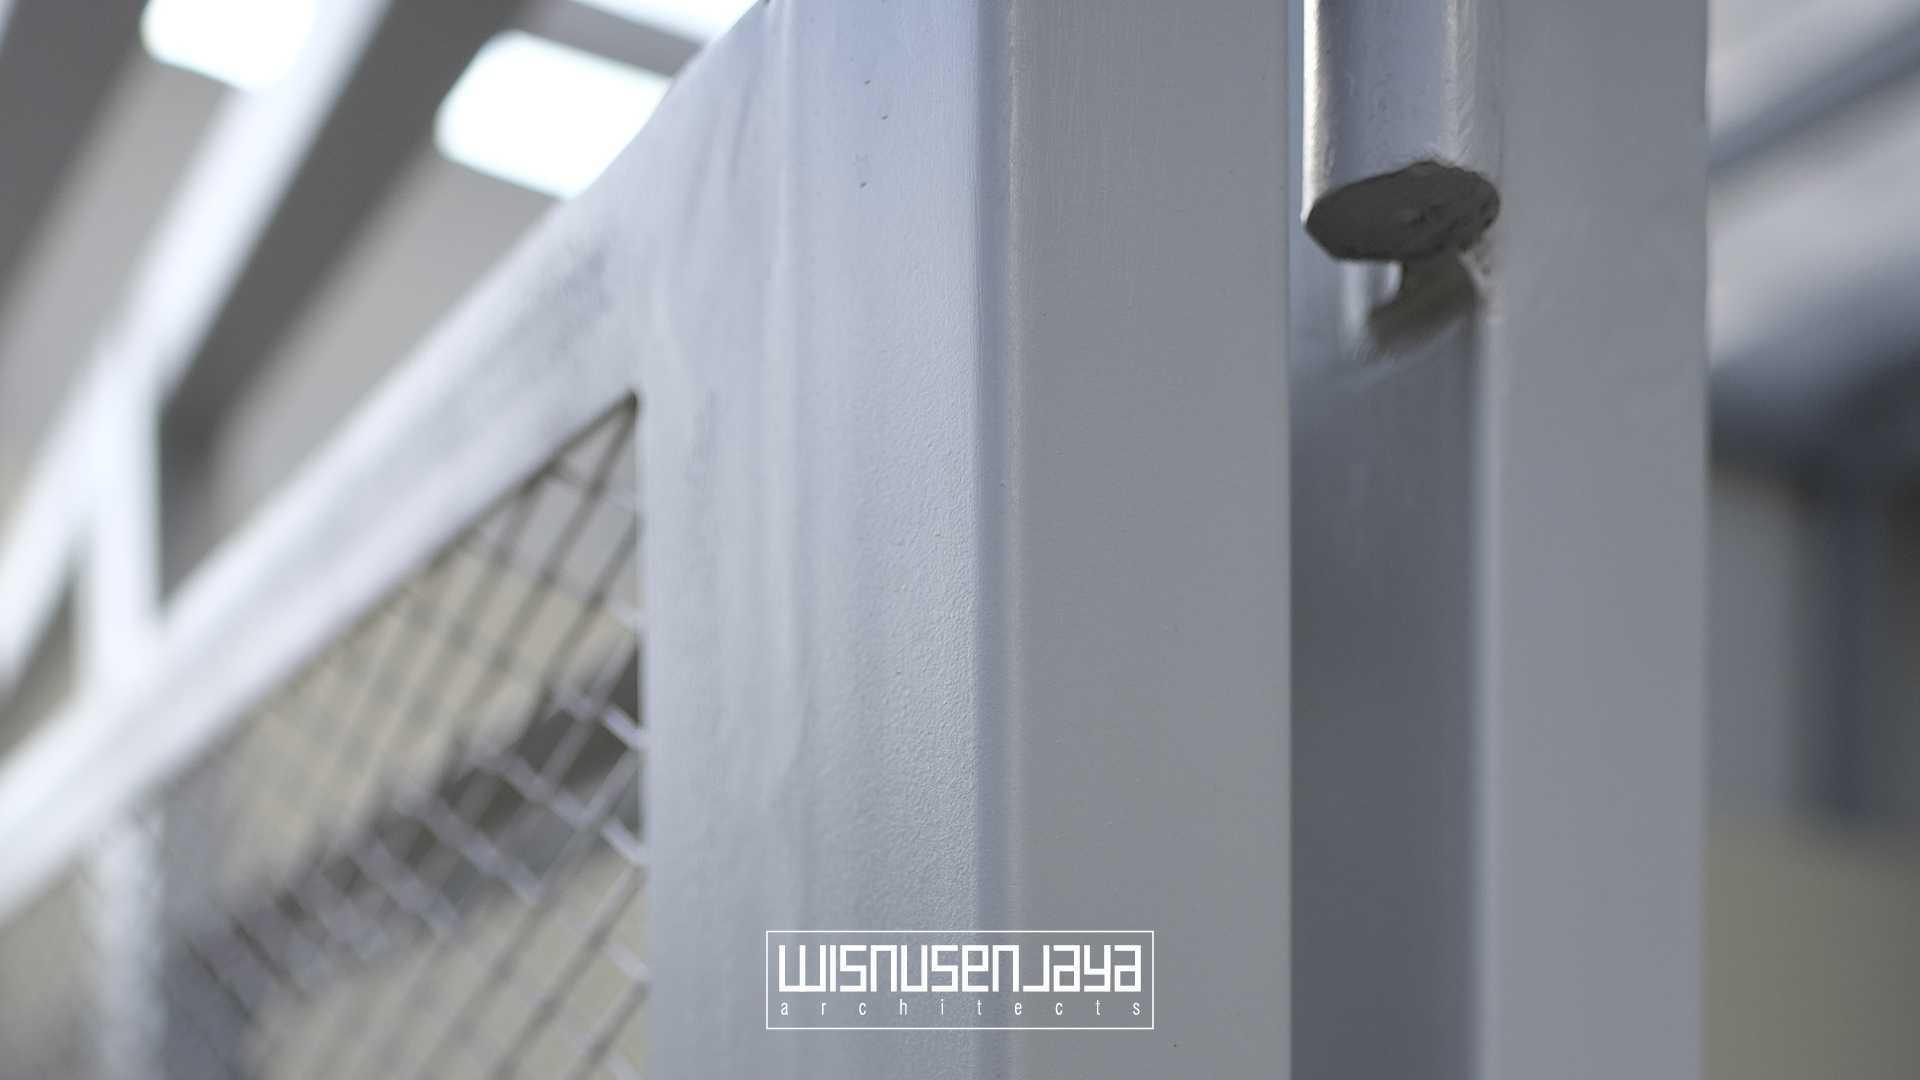 Wisnu Senjaya Architects Rumah Sisip Klp. Gading, Kota Jkt Utara, Daerah Khusus Ibukota Jakarta, Indonesia Klp. Gading, Kota Jkt Utara, Daerah Khusus Ibukota Jakarta, Indonesia Wisnu-Senjaya-Architects-Rumah-Sisip   84915